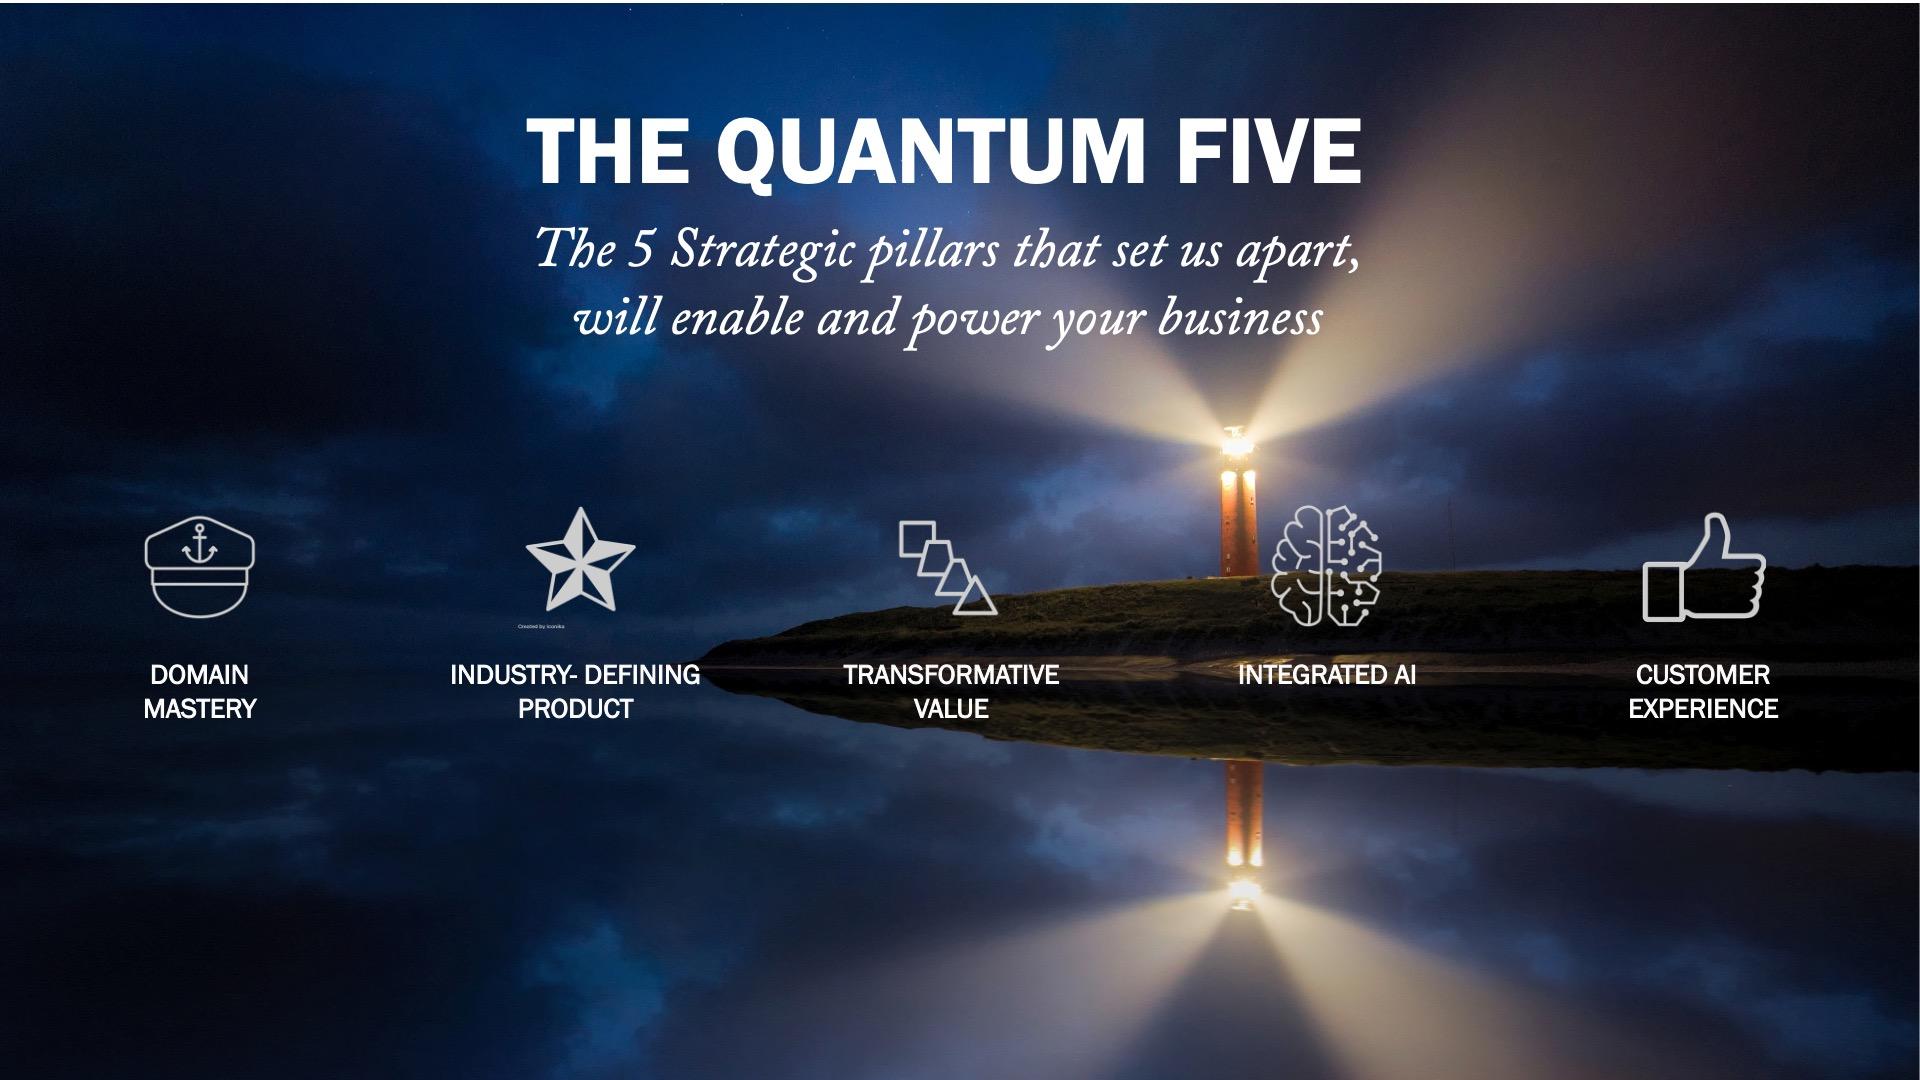 The Quantum Five